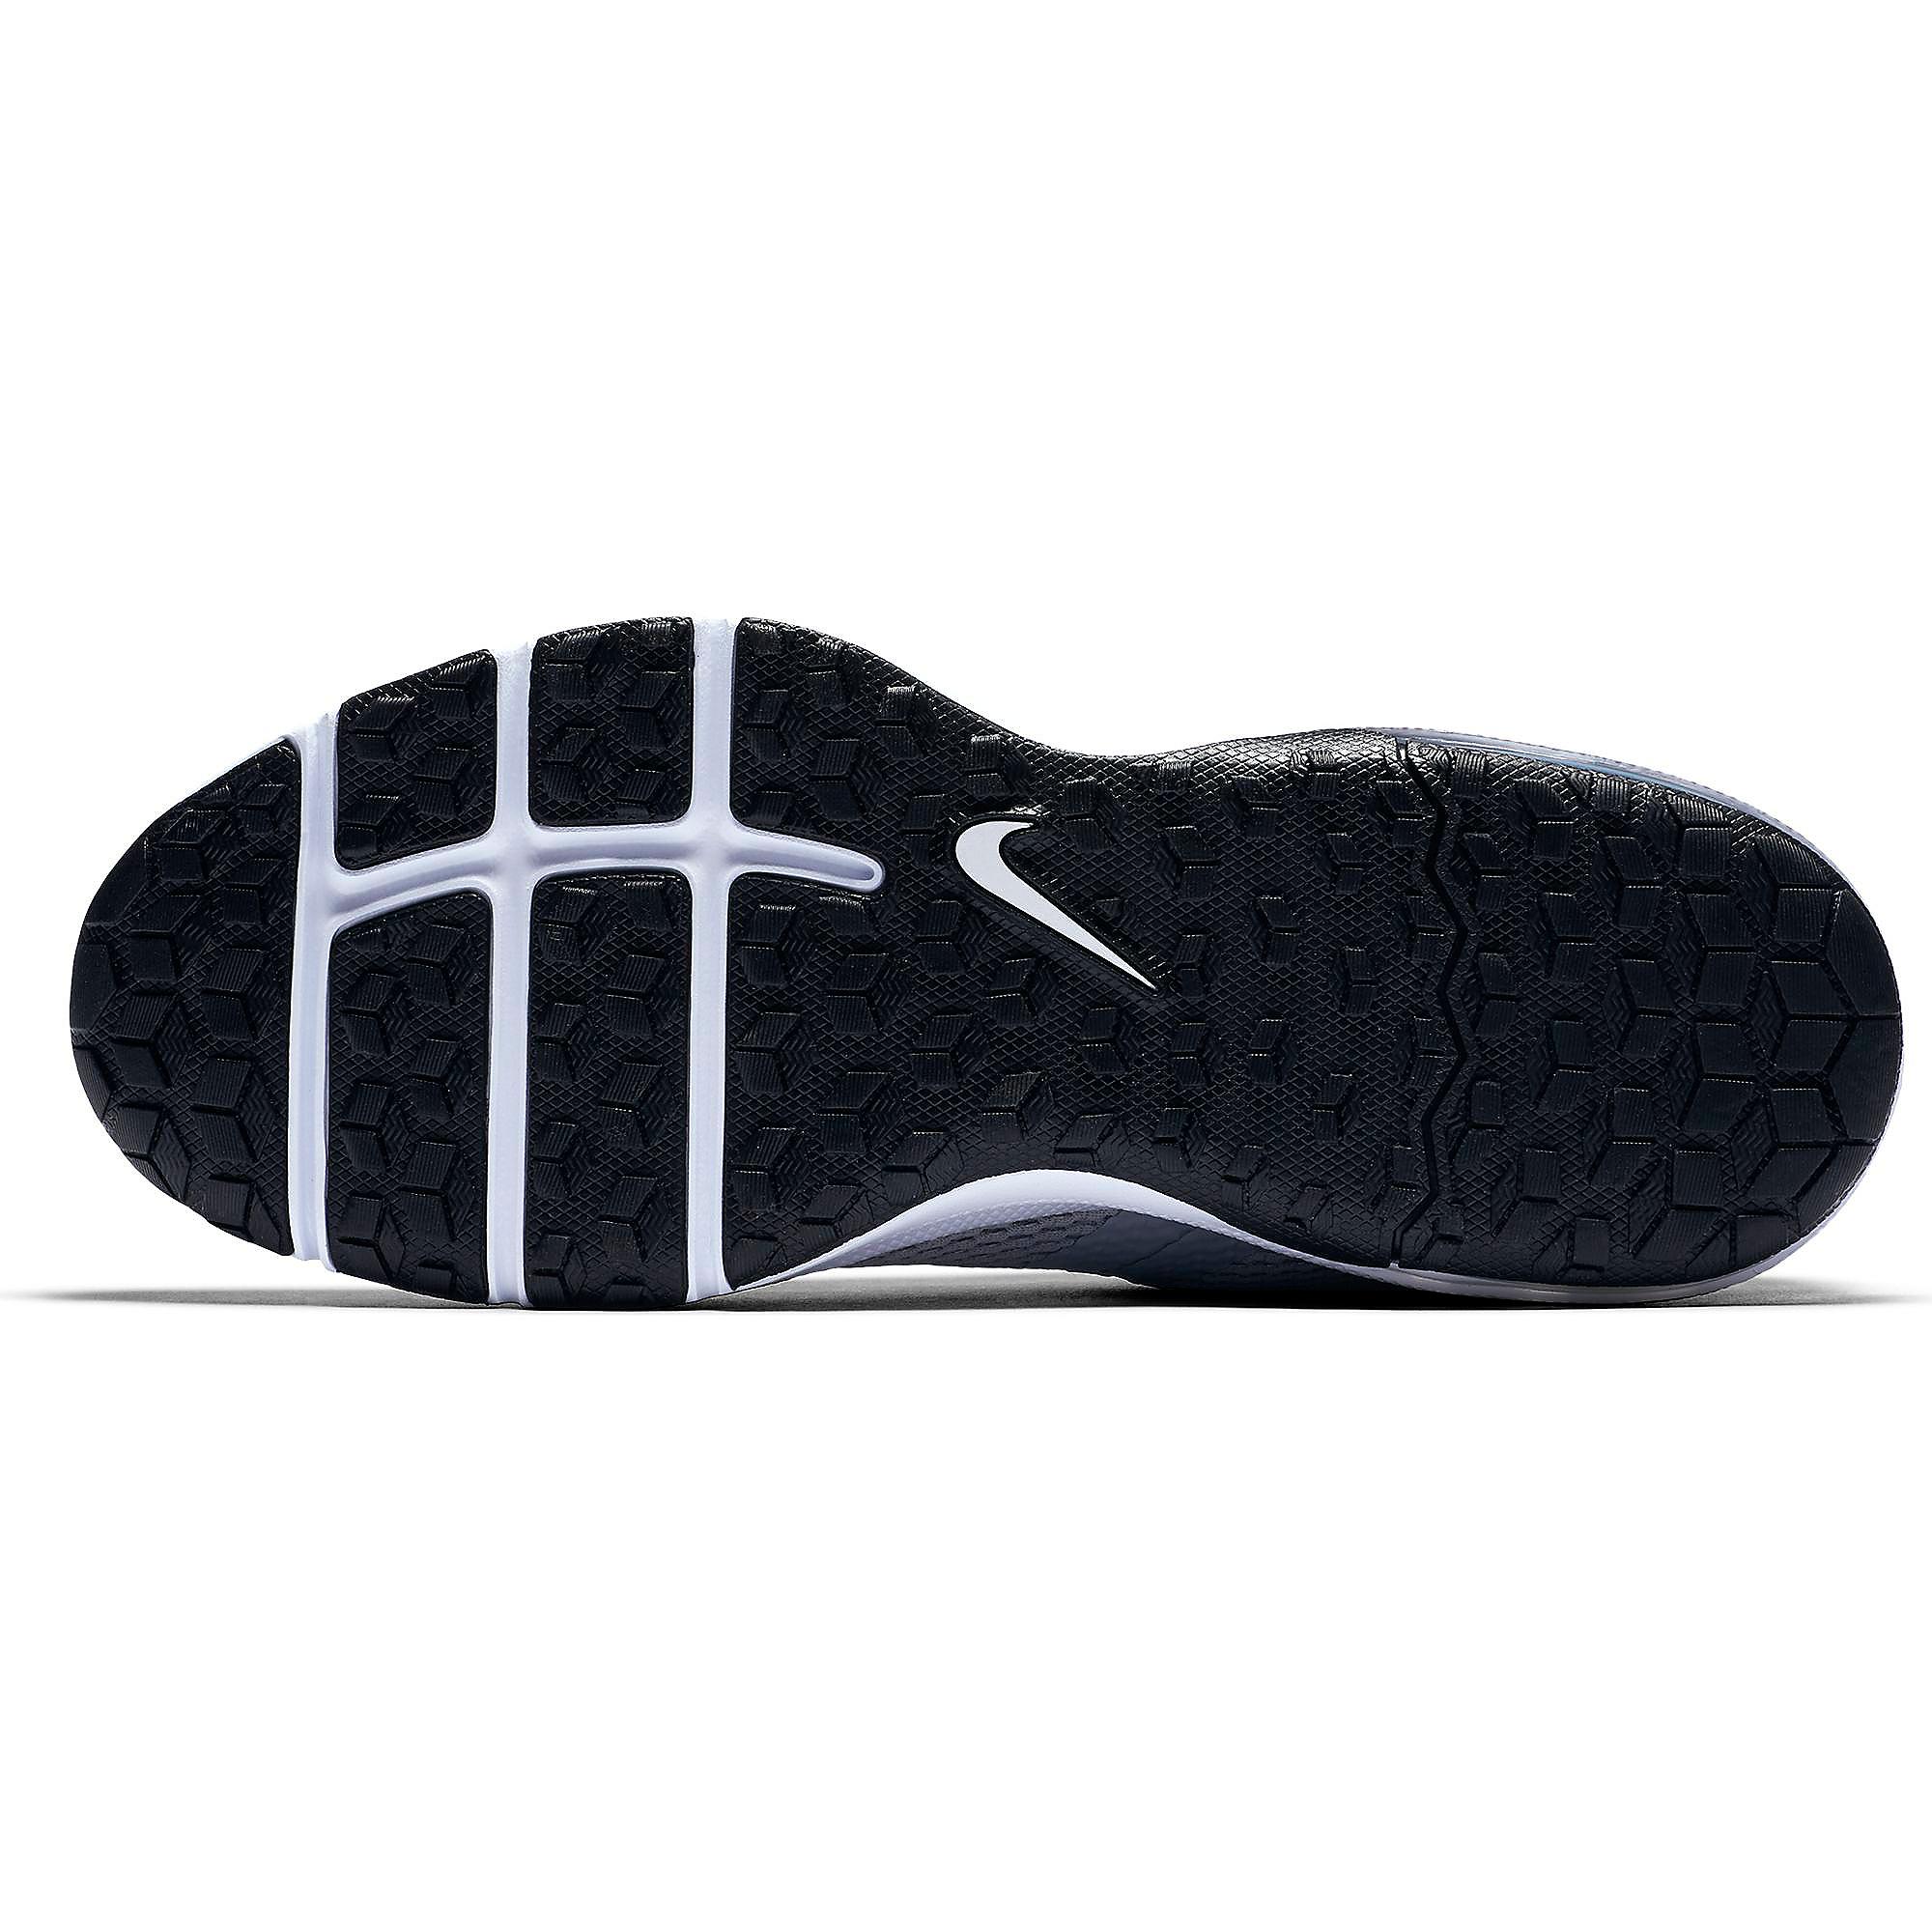 "Dallas Cowboys Mens Nike Air Max Typha 2 Training Shoe Dallas Cowboys Pro Shop ""title = Dallas Cowboys Pro Shop"